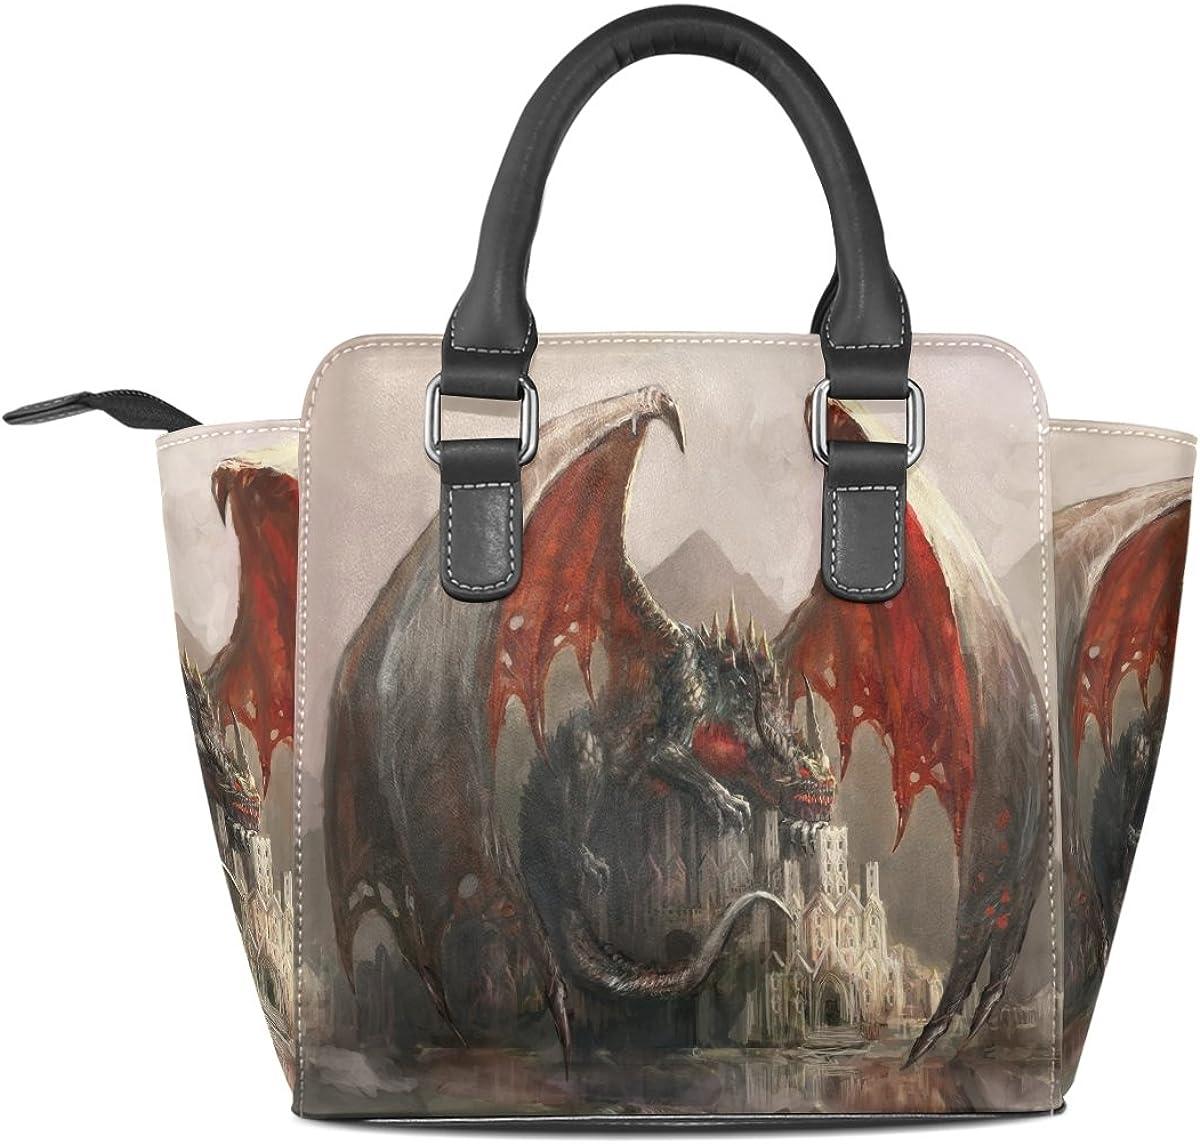 Jennifer Lazy Dragon Sleeping Castle PU Leather Top-Handle Handbags Single-Shoulder Tote Crossbody Bag Messenger Bags For Women